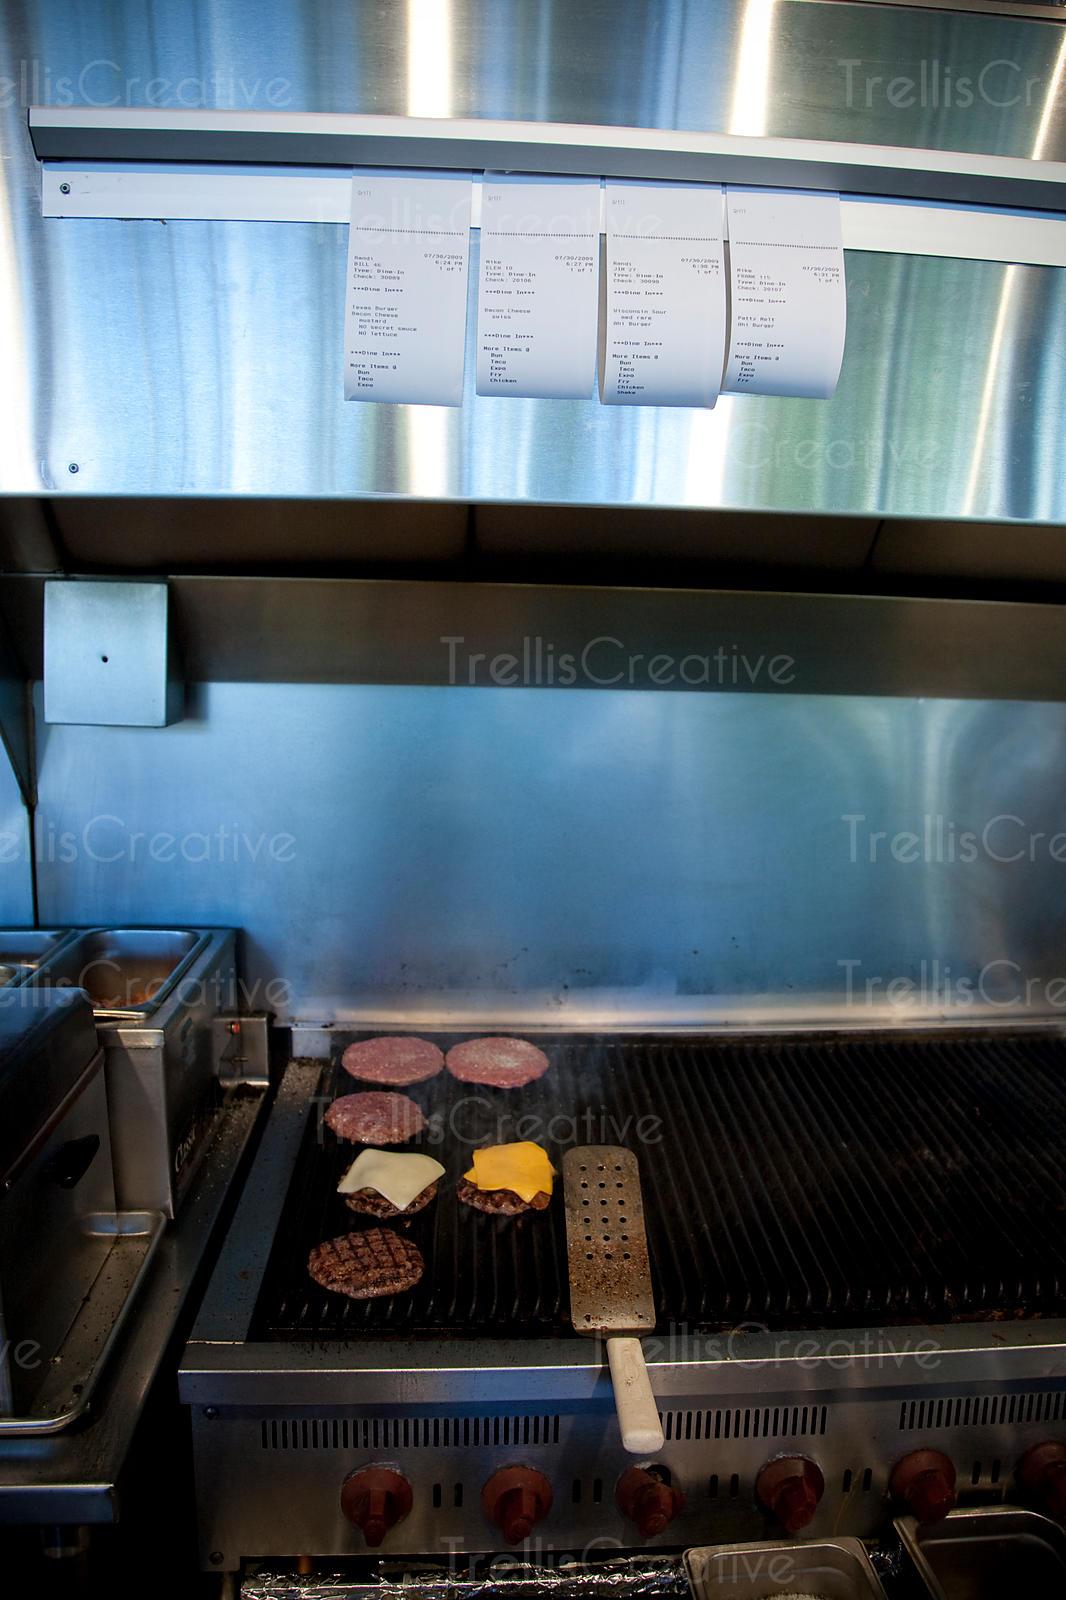 Trellis Creative | Cooking